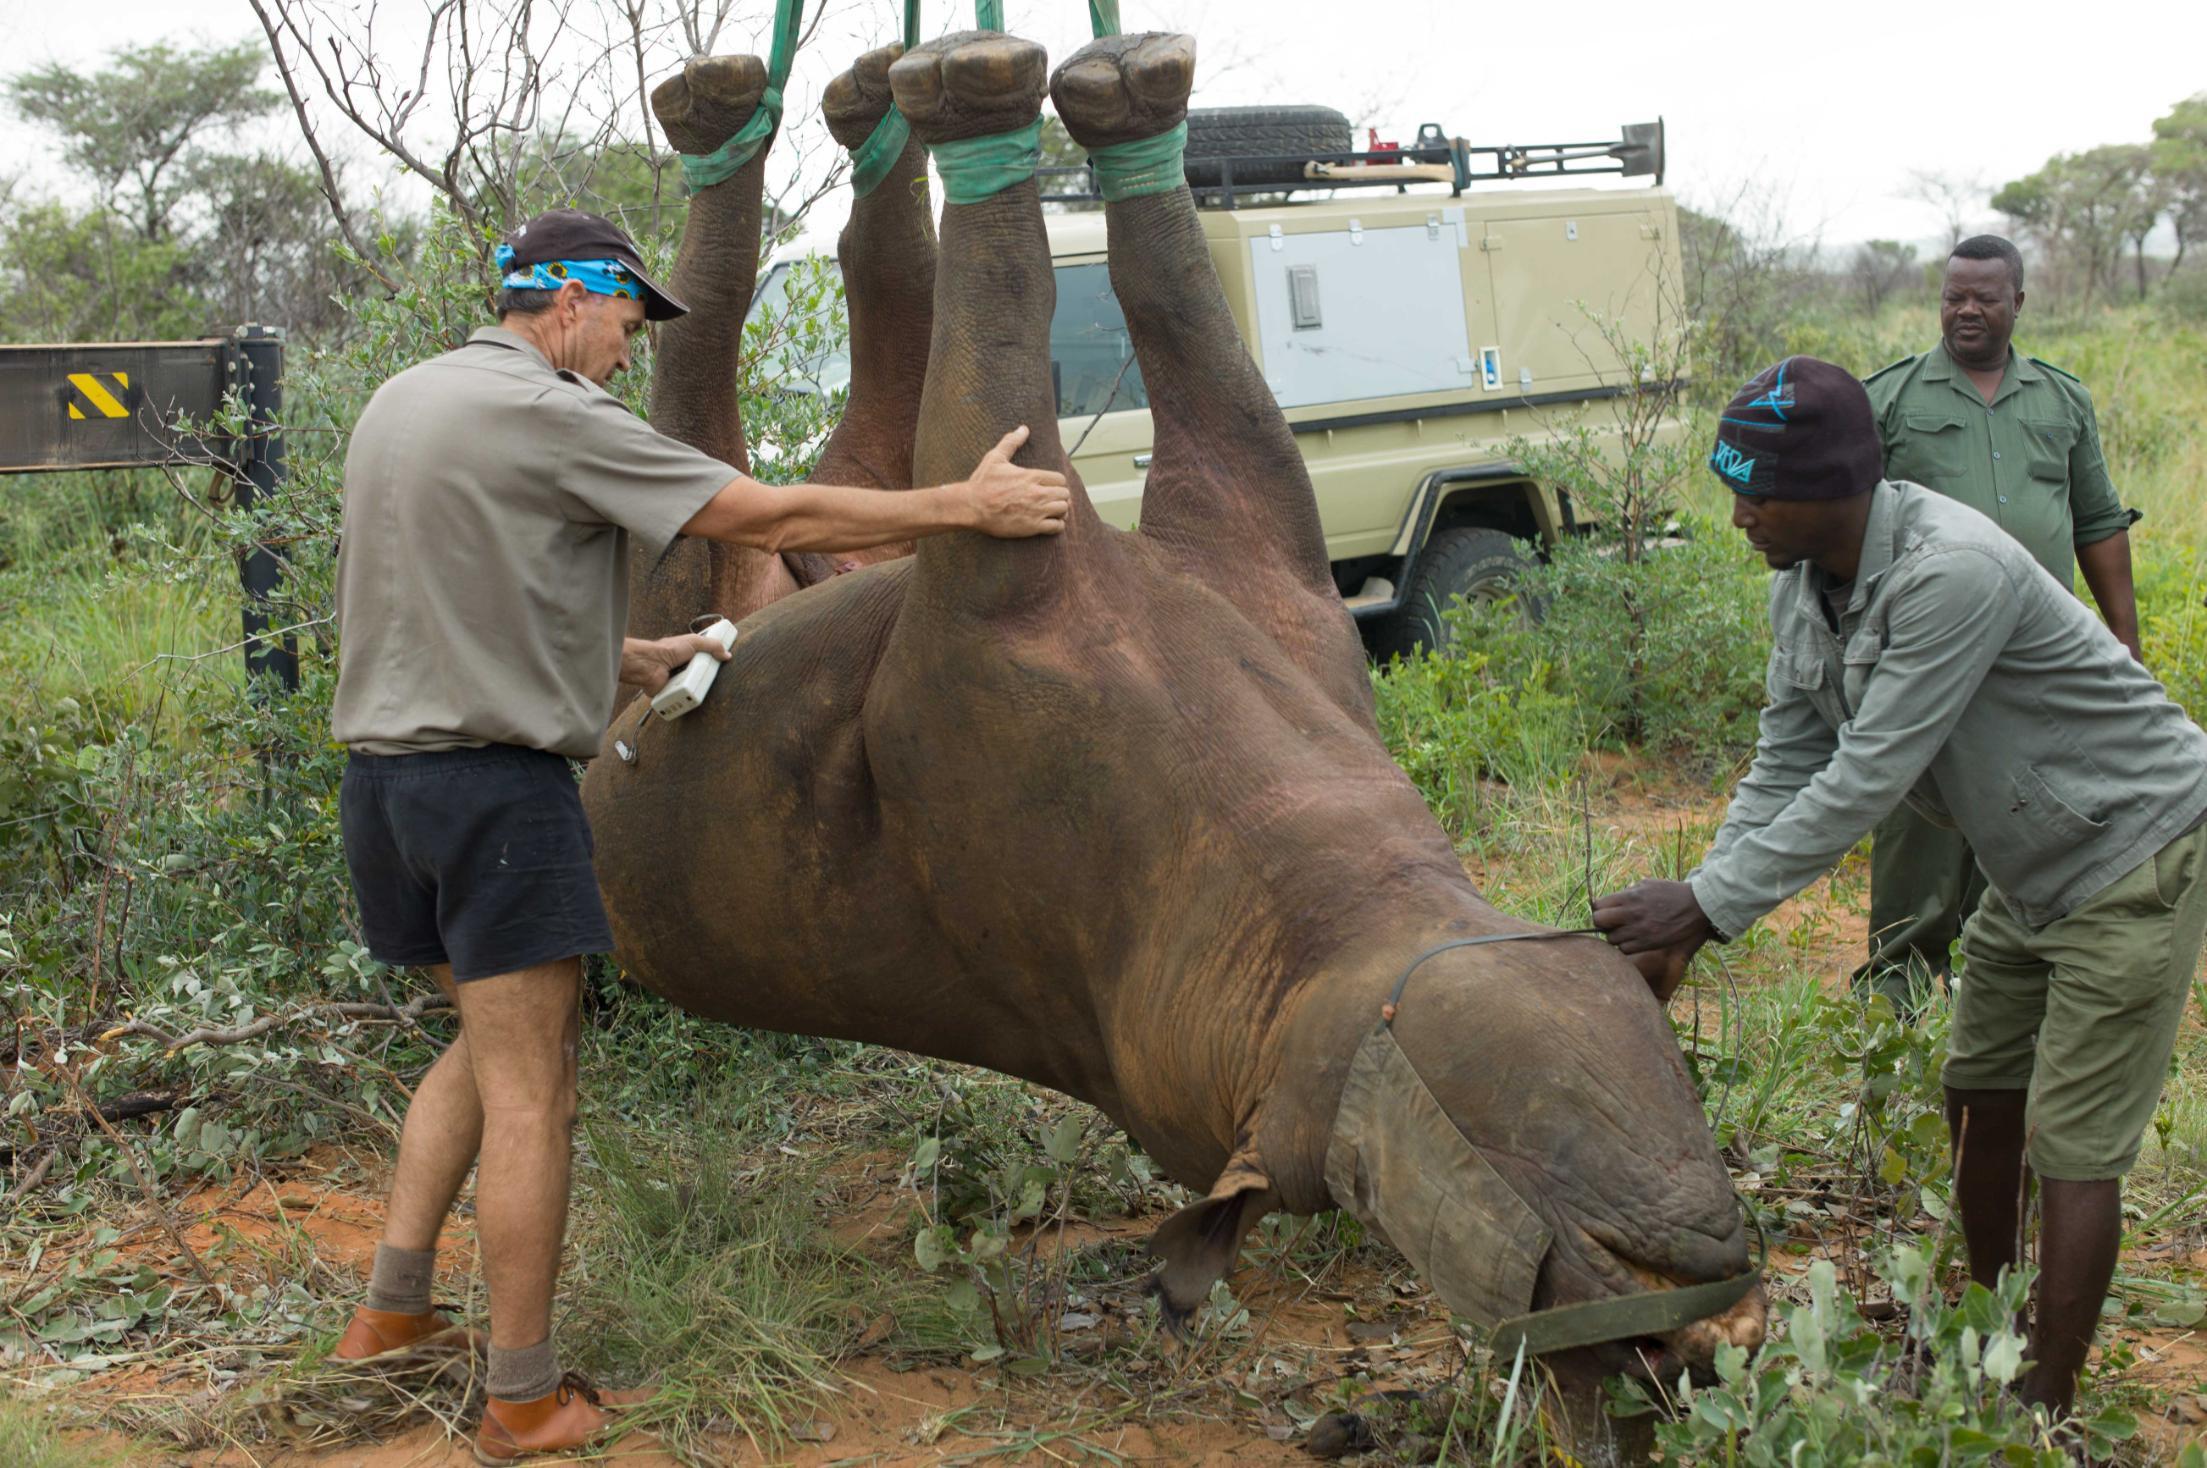 Upside-down rhino experiment wins Ig Nobel Prize